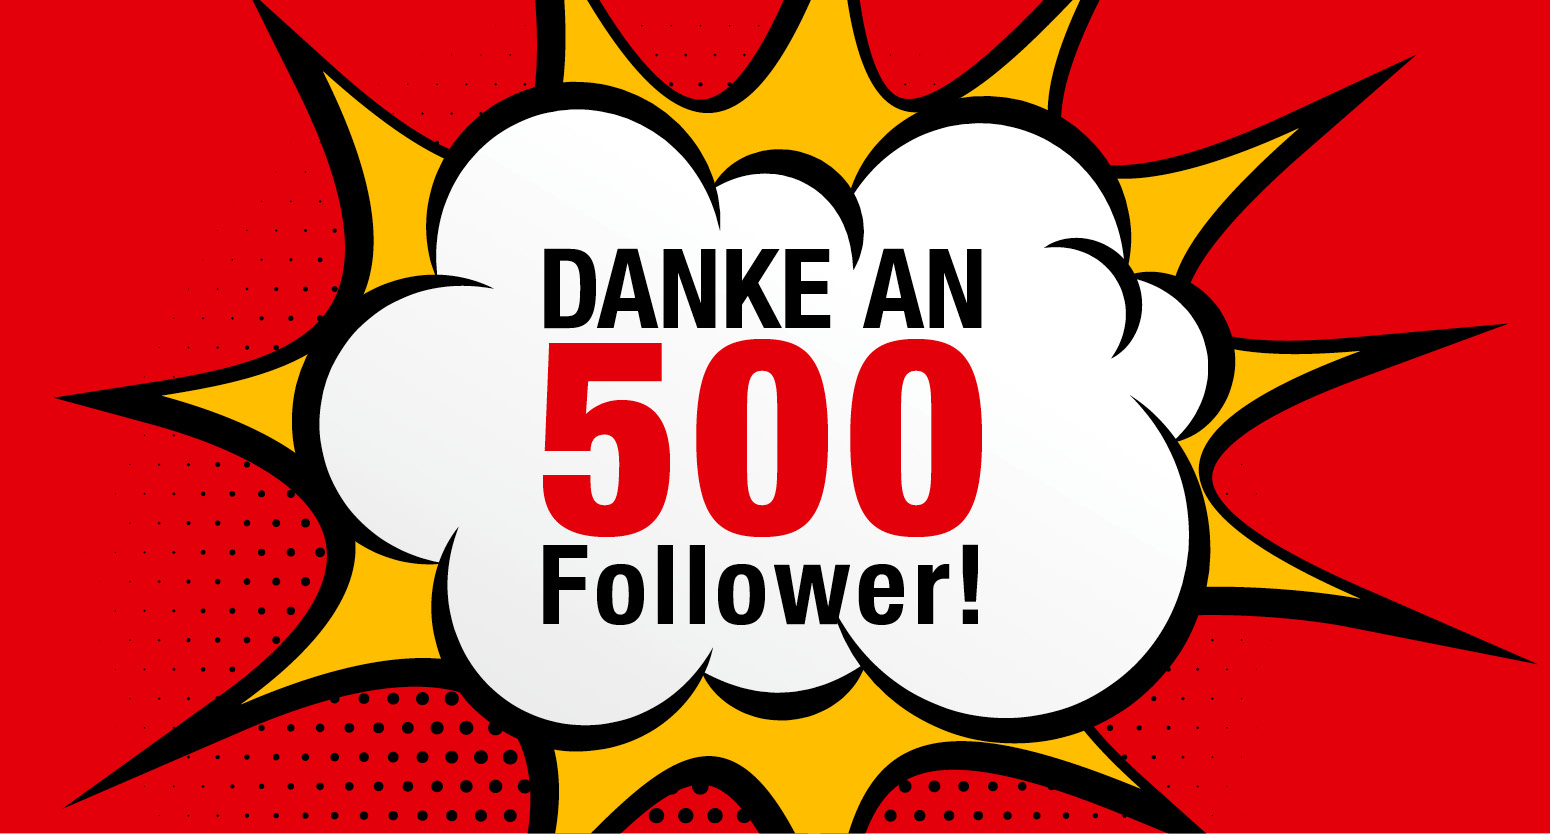 RAPA sagt Danke für 500 Follower!